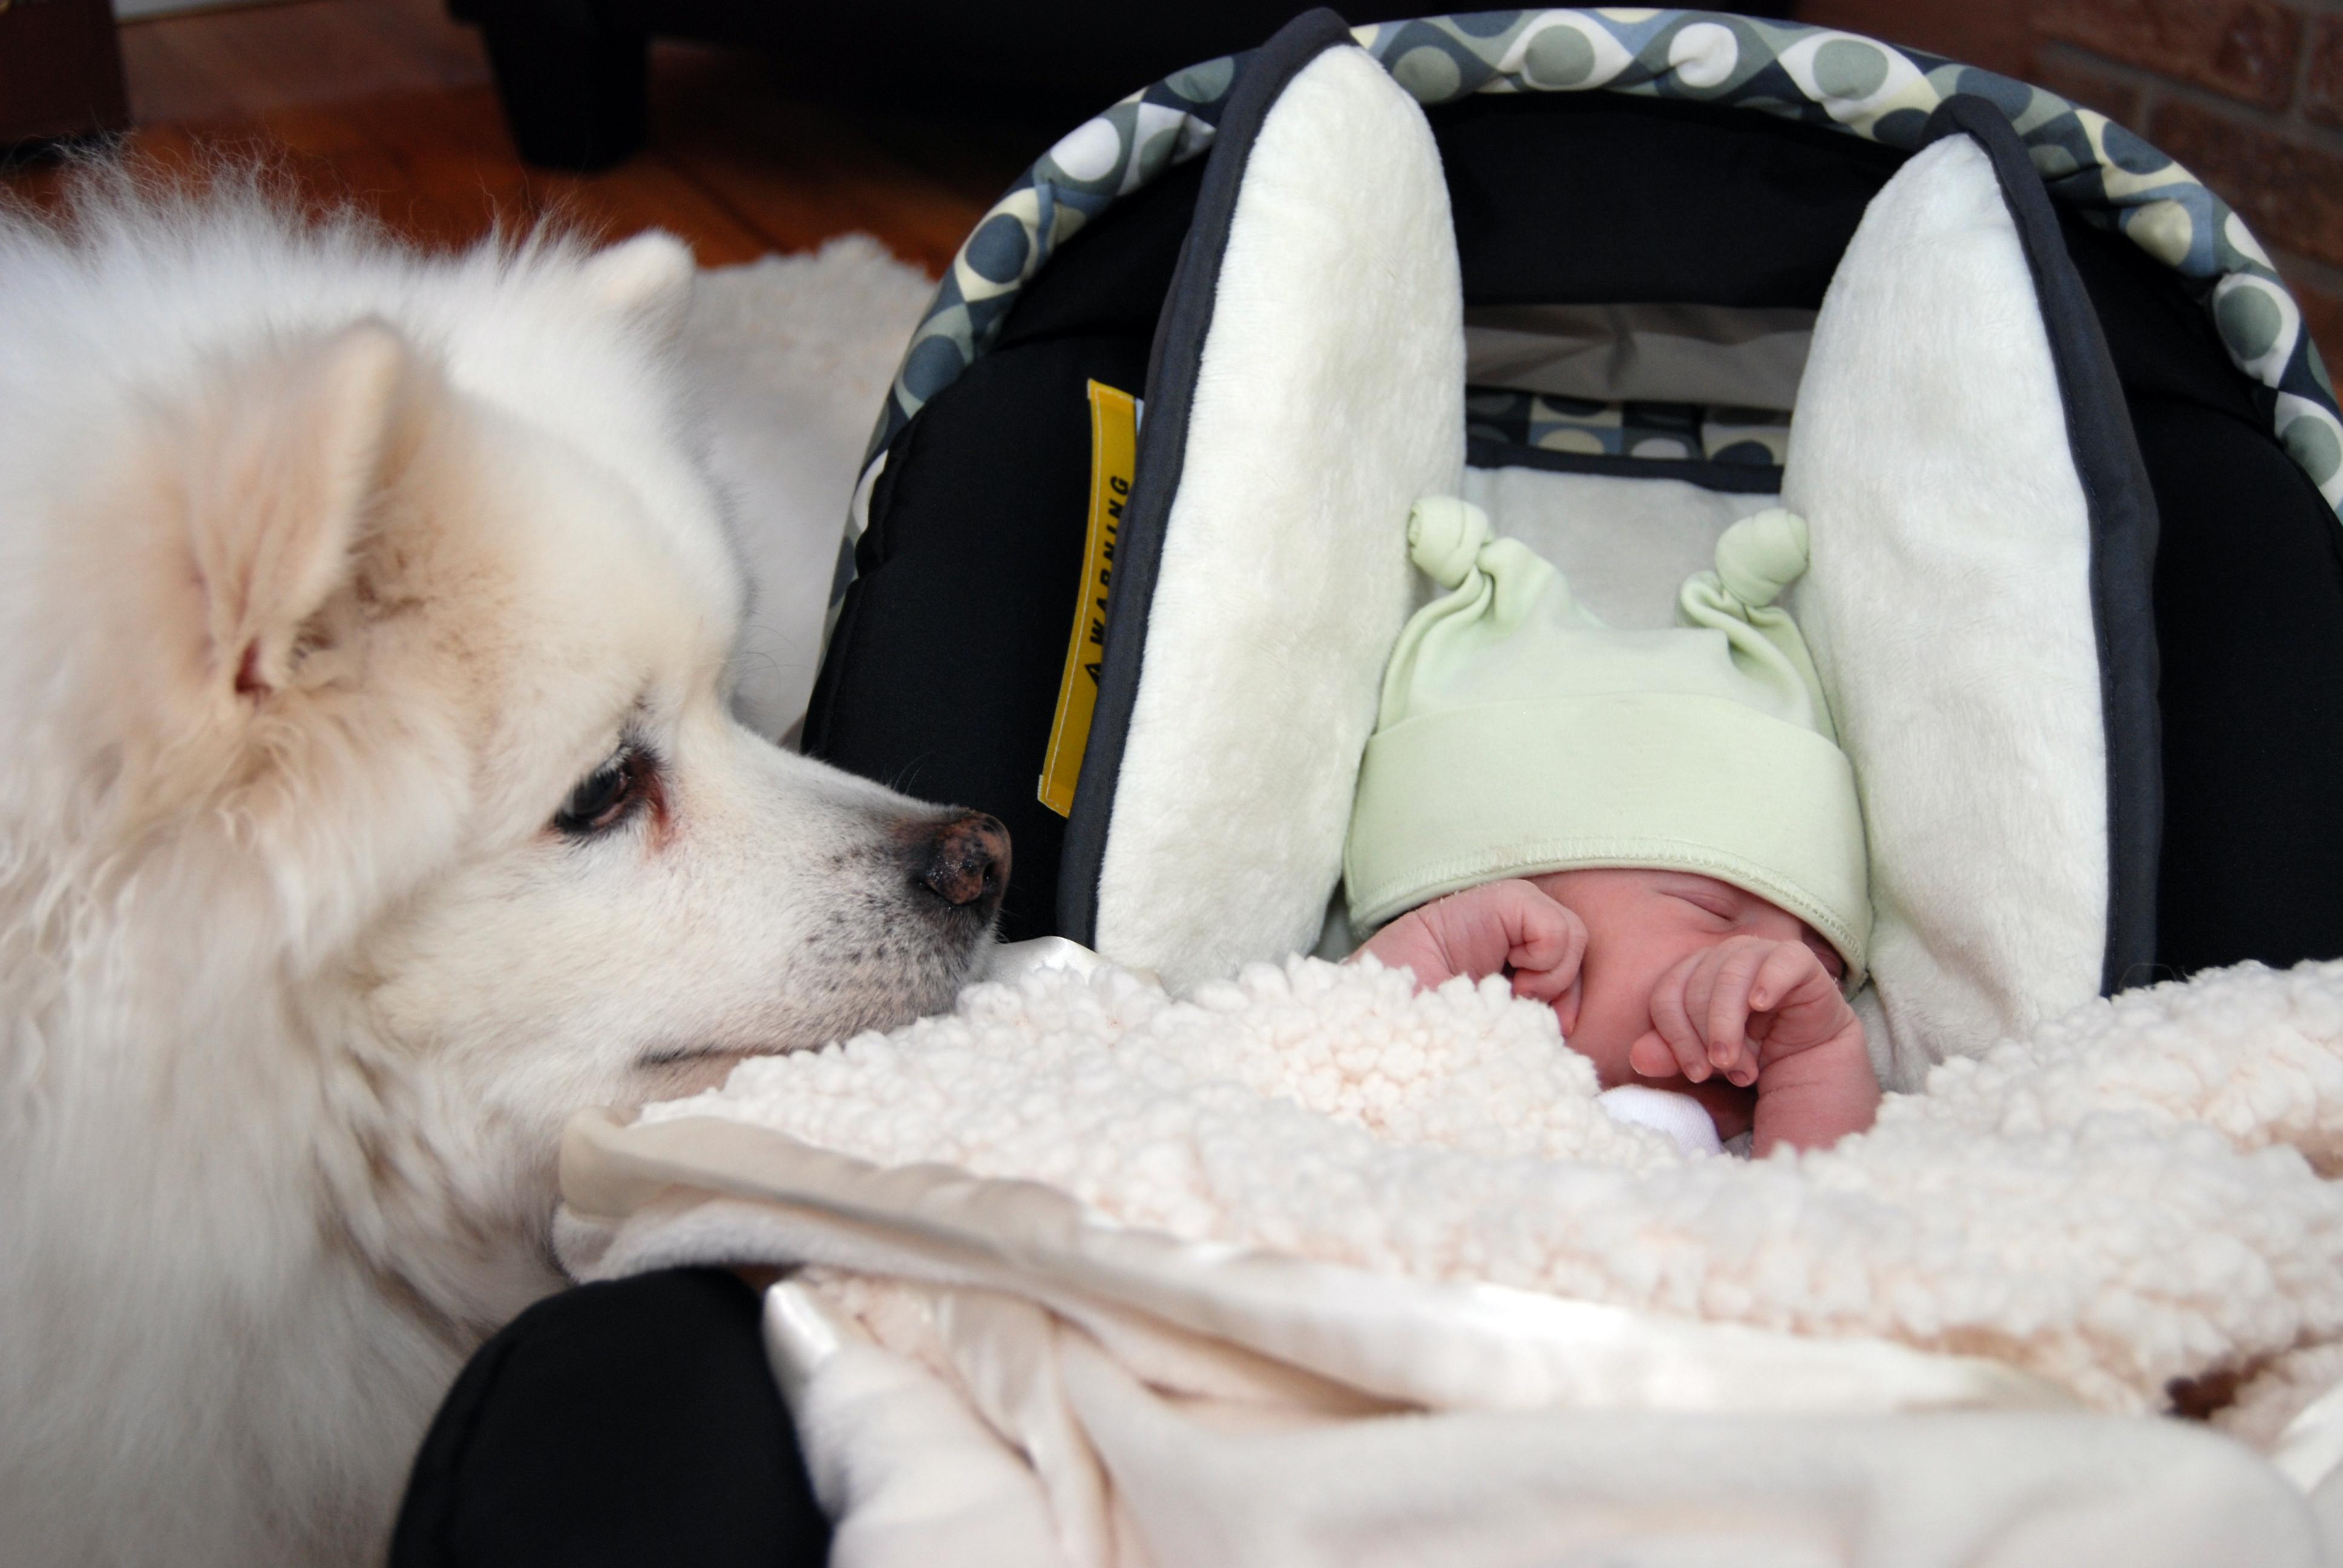 dog obedience skills - dog resting near baby in car seat